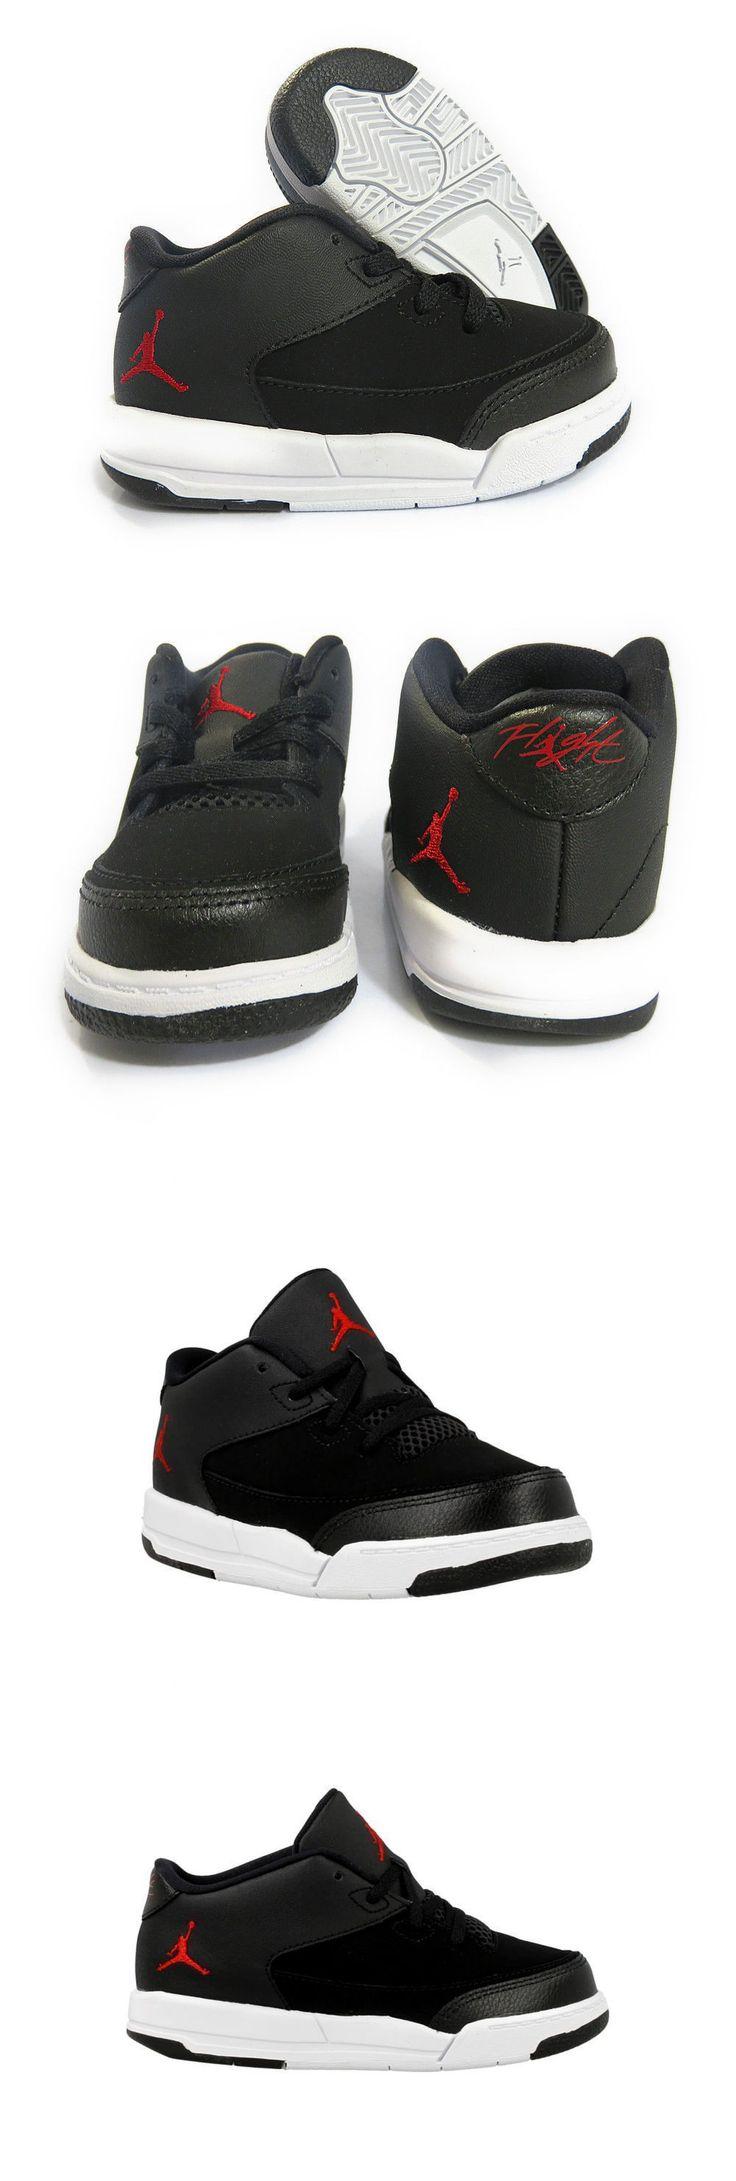 Infant Shoes: 820248-001 Air Jordan Flight Origin 3 Bt Nib! Toddler Blk Wht Red Sz: 7C -> BUY IT NOW ONLY: $36.94 on eBay!